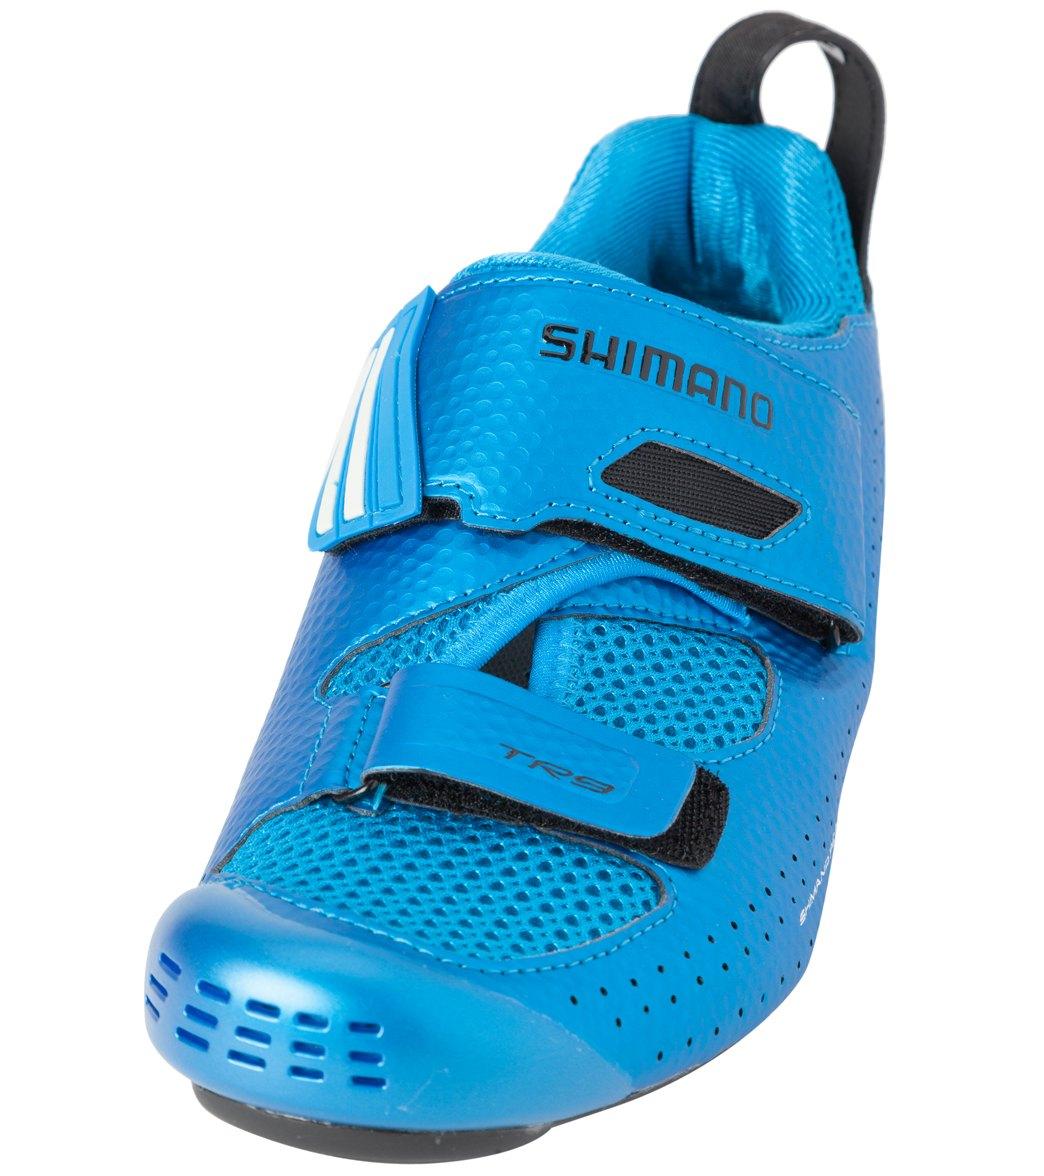 Shimano SH-TR9 blue - Triathlon Schuhe 46 pSW0NKQ